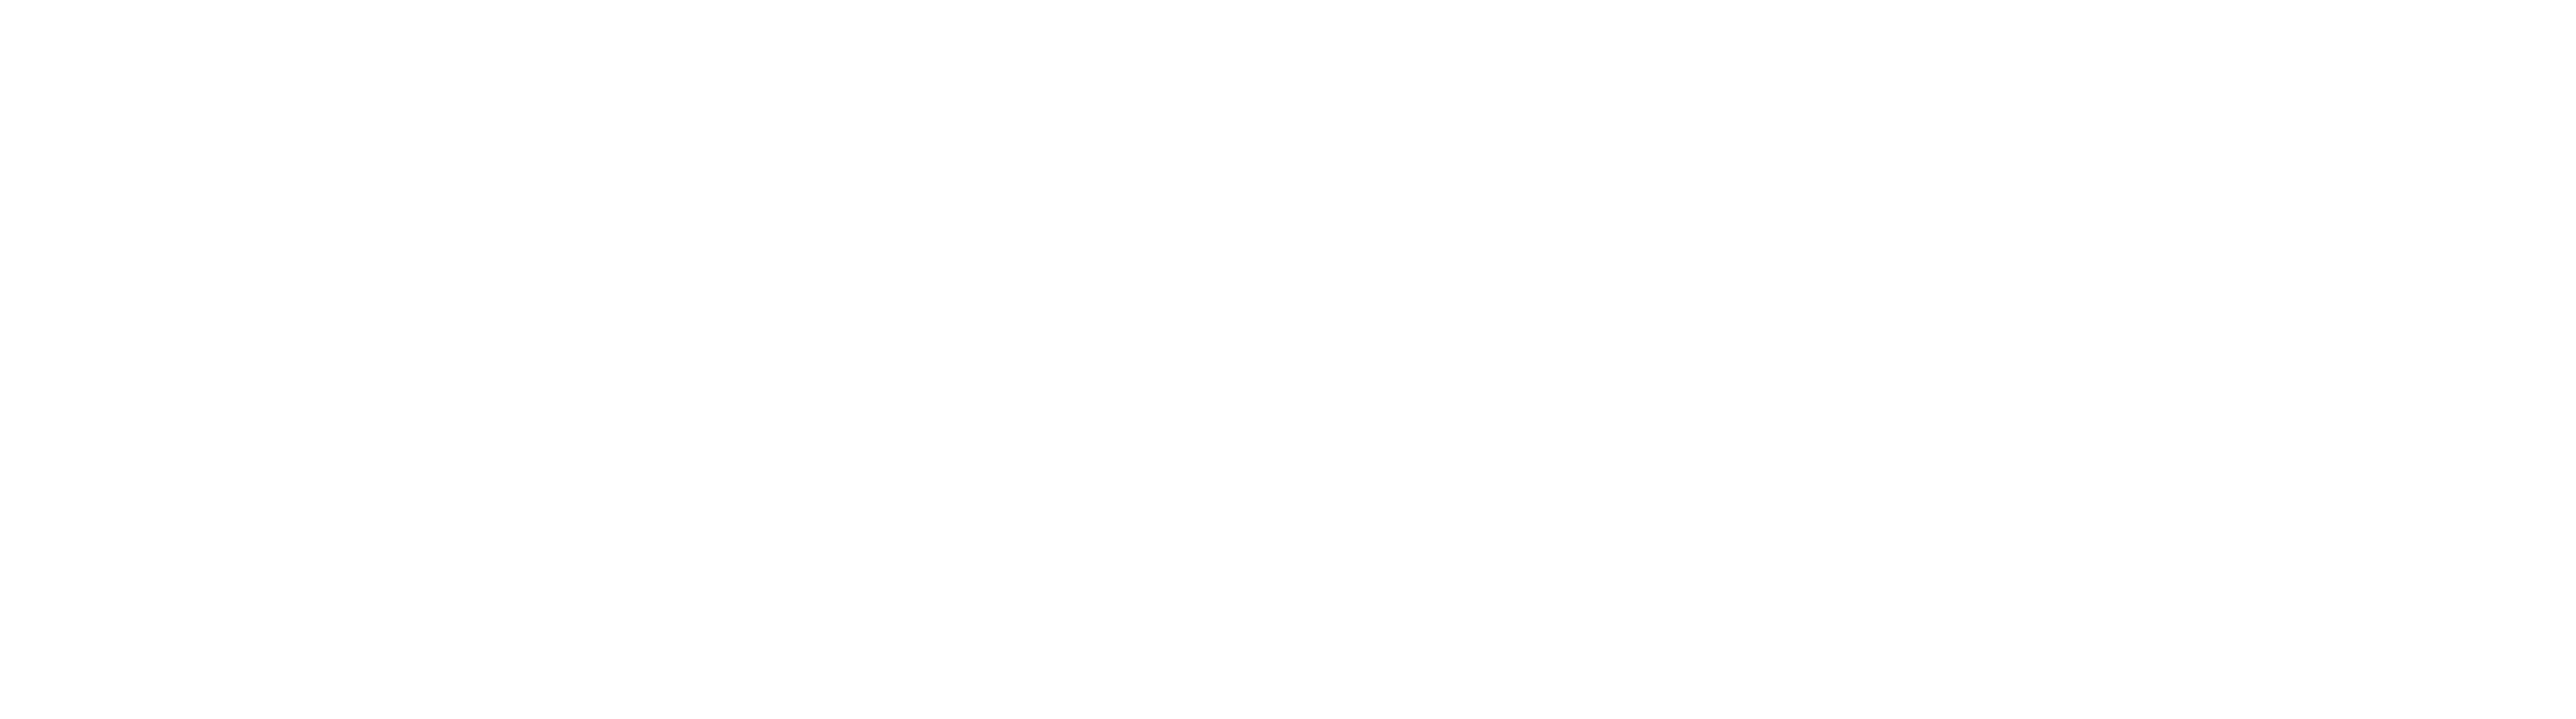 white curved edge for design